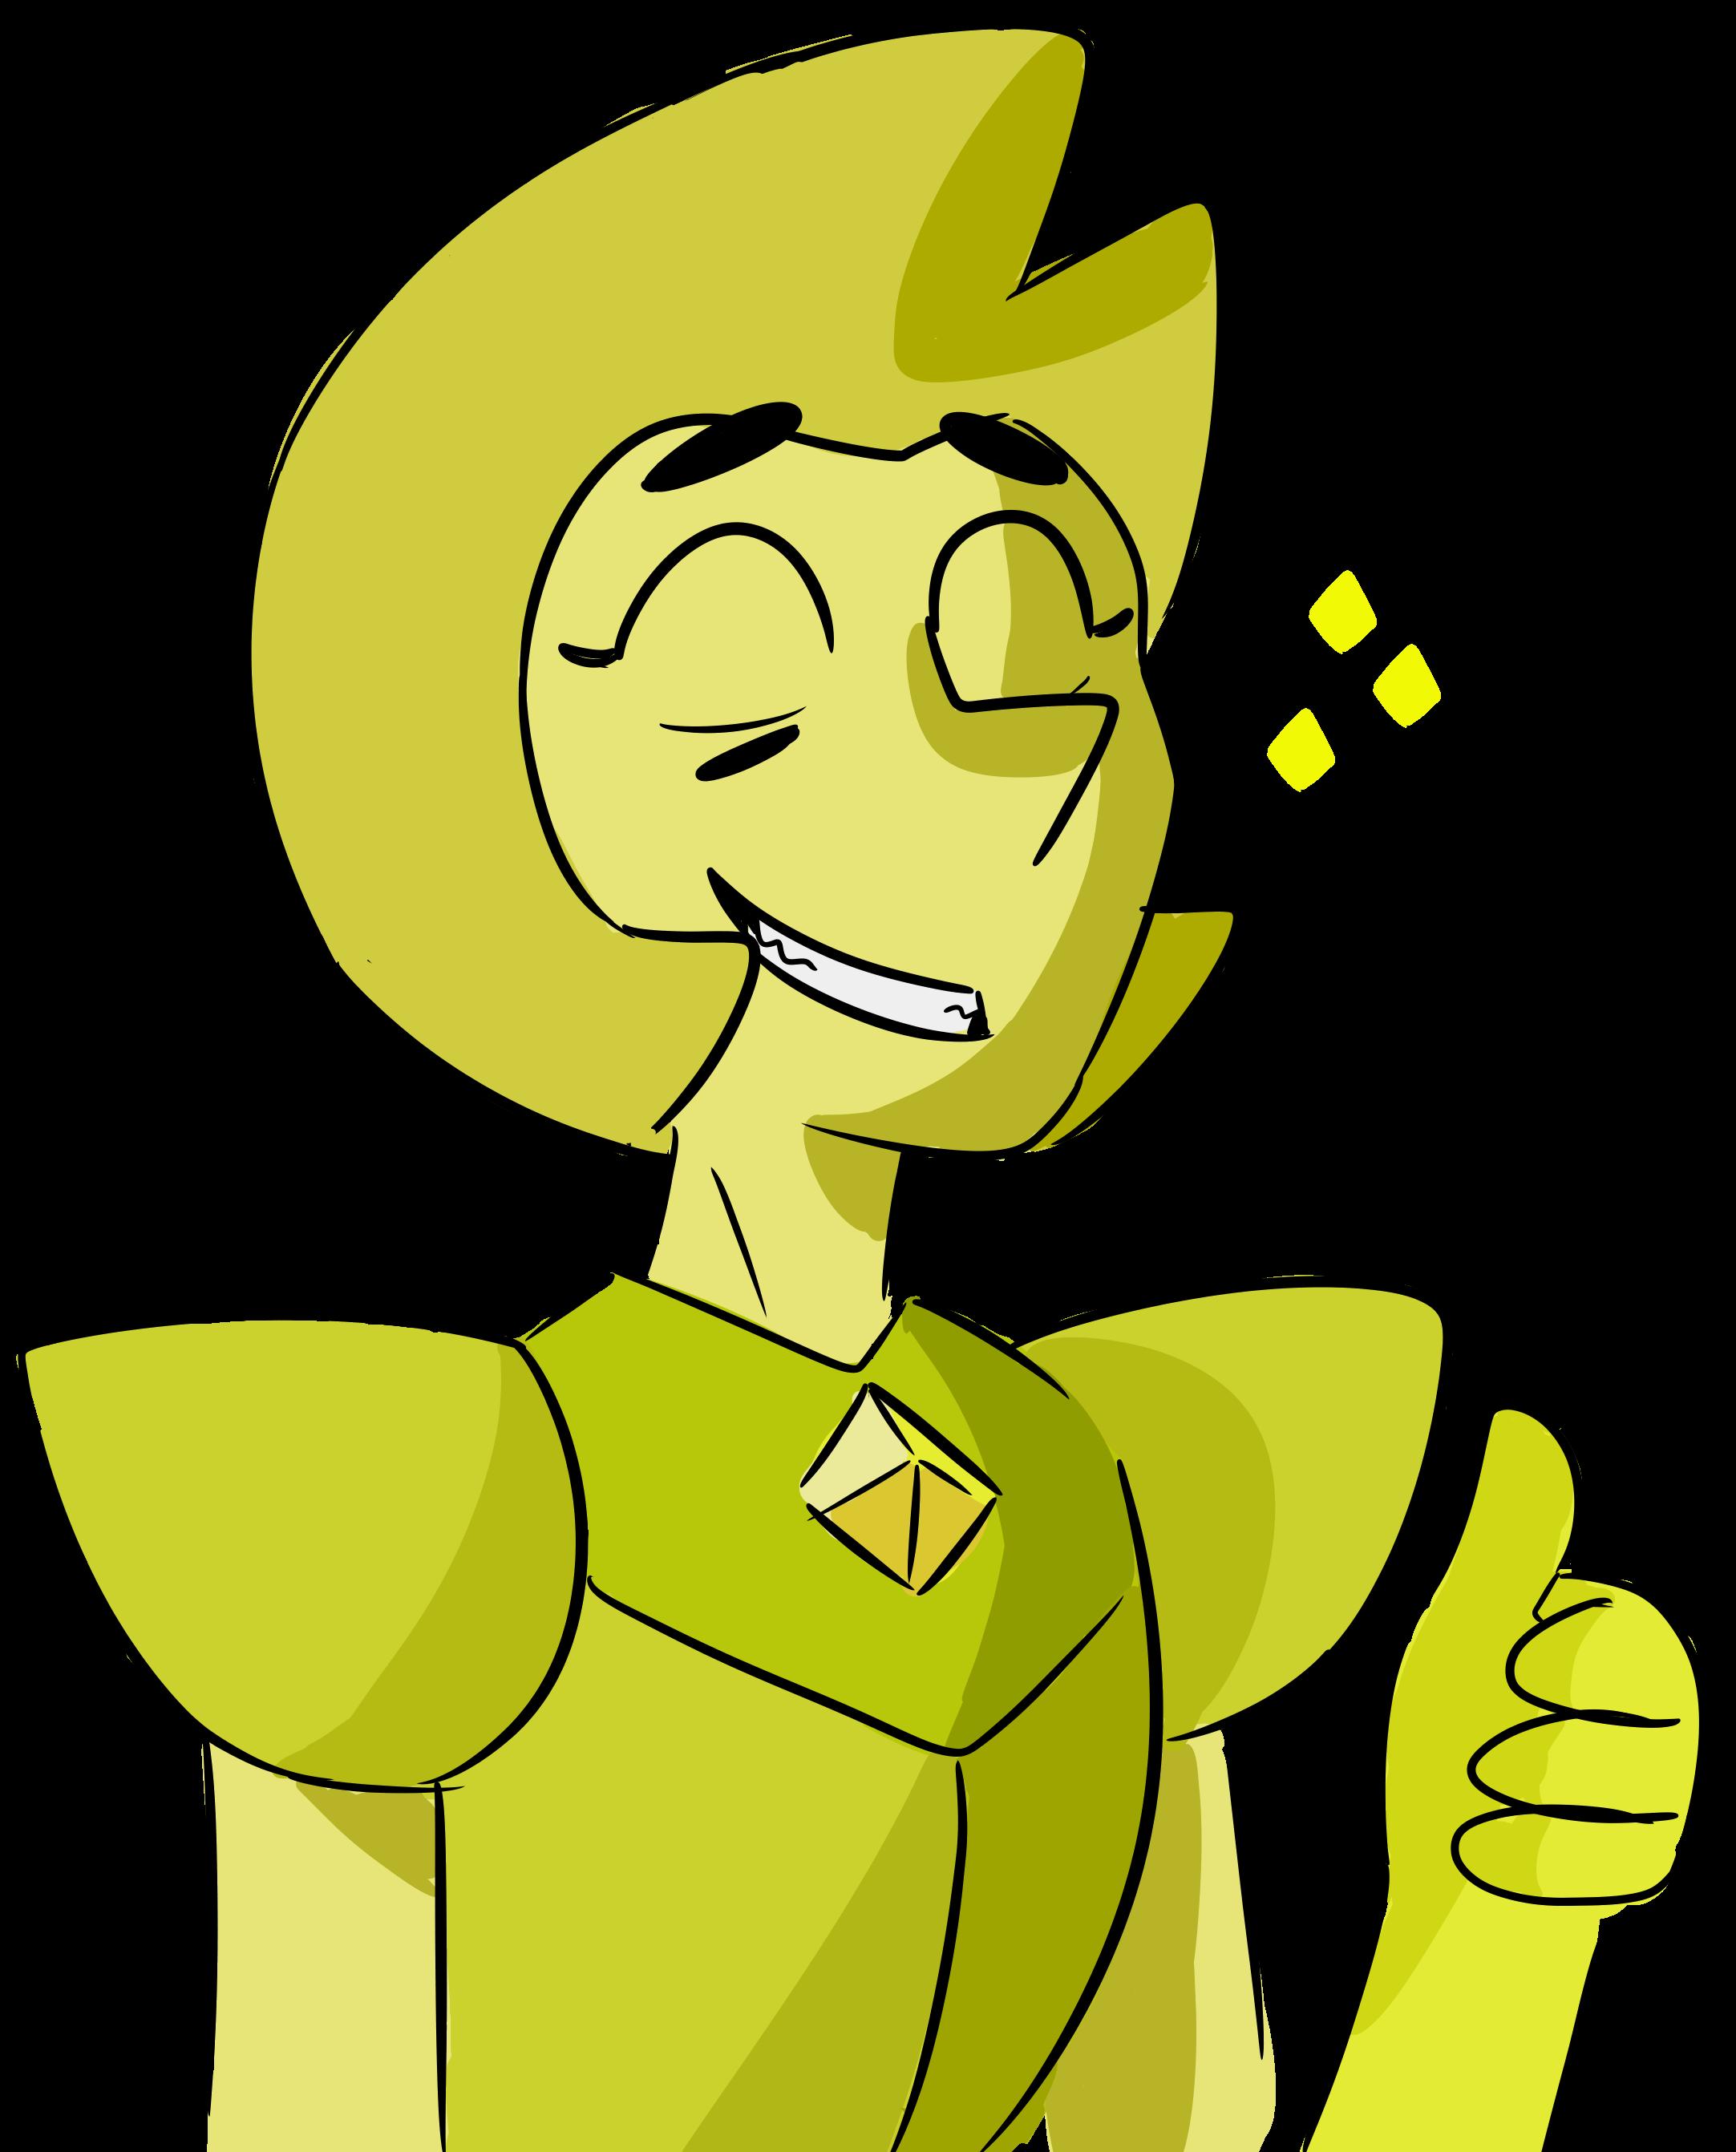 Ooc yellow diamond